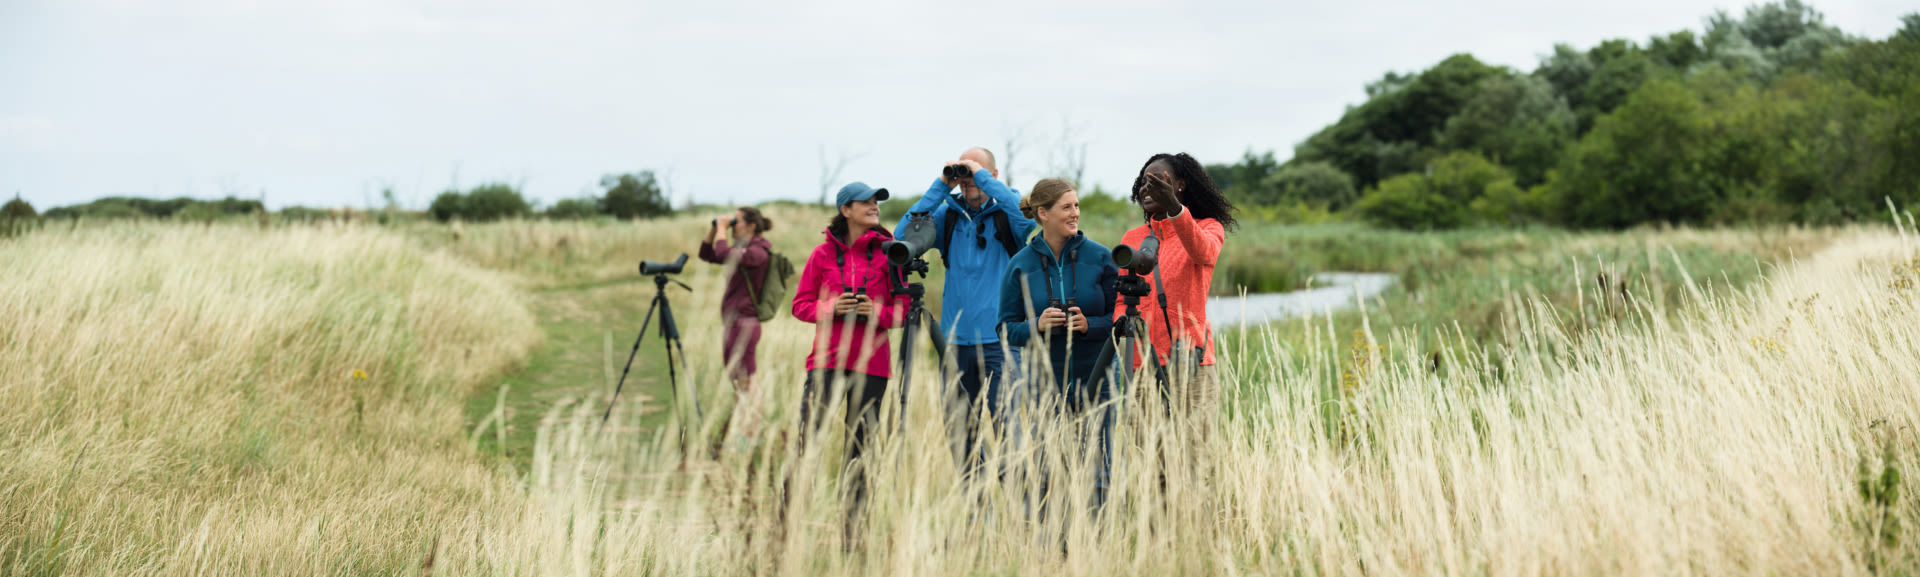 Tripods, BTX, ATX 85, ATX 65, EL 42, EL 50, CL Companion Social Birder, Titchwell Birding Shooting